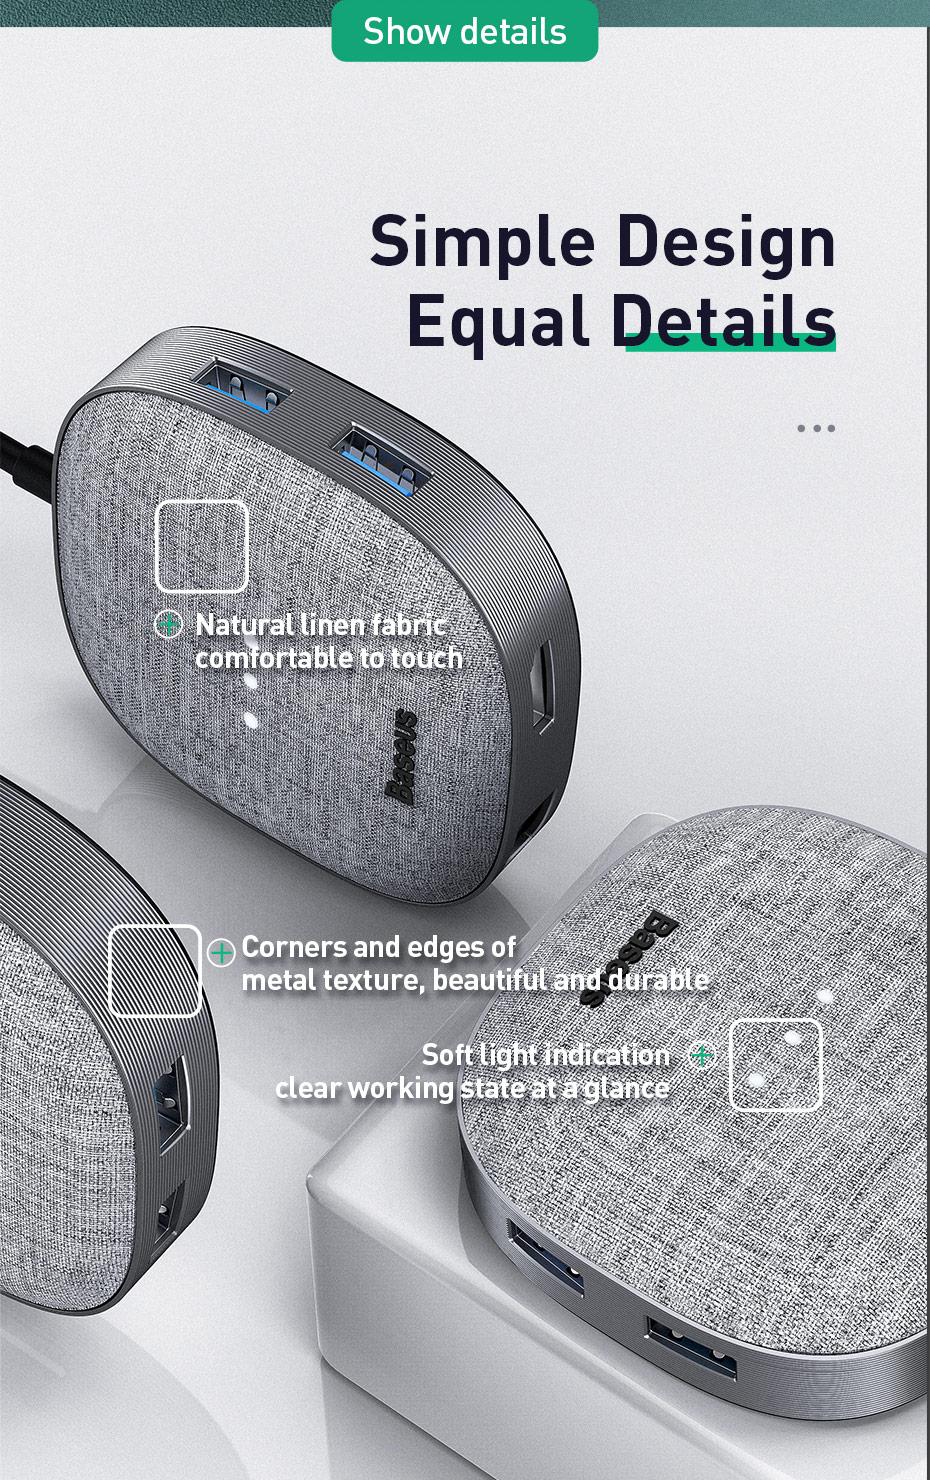 Baseus Frabric Series 7 in 1 Type-C Multifunctional HUB Adapter12